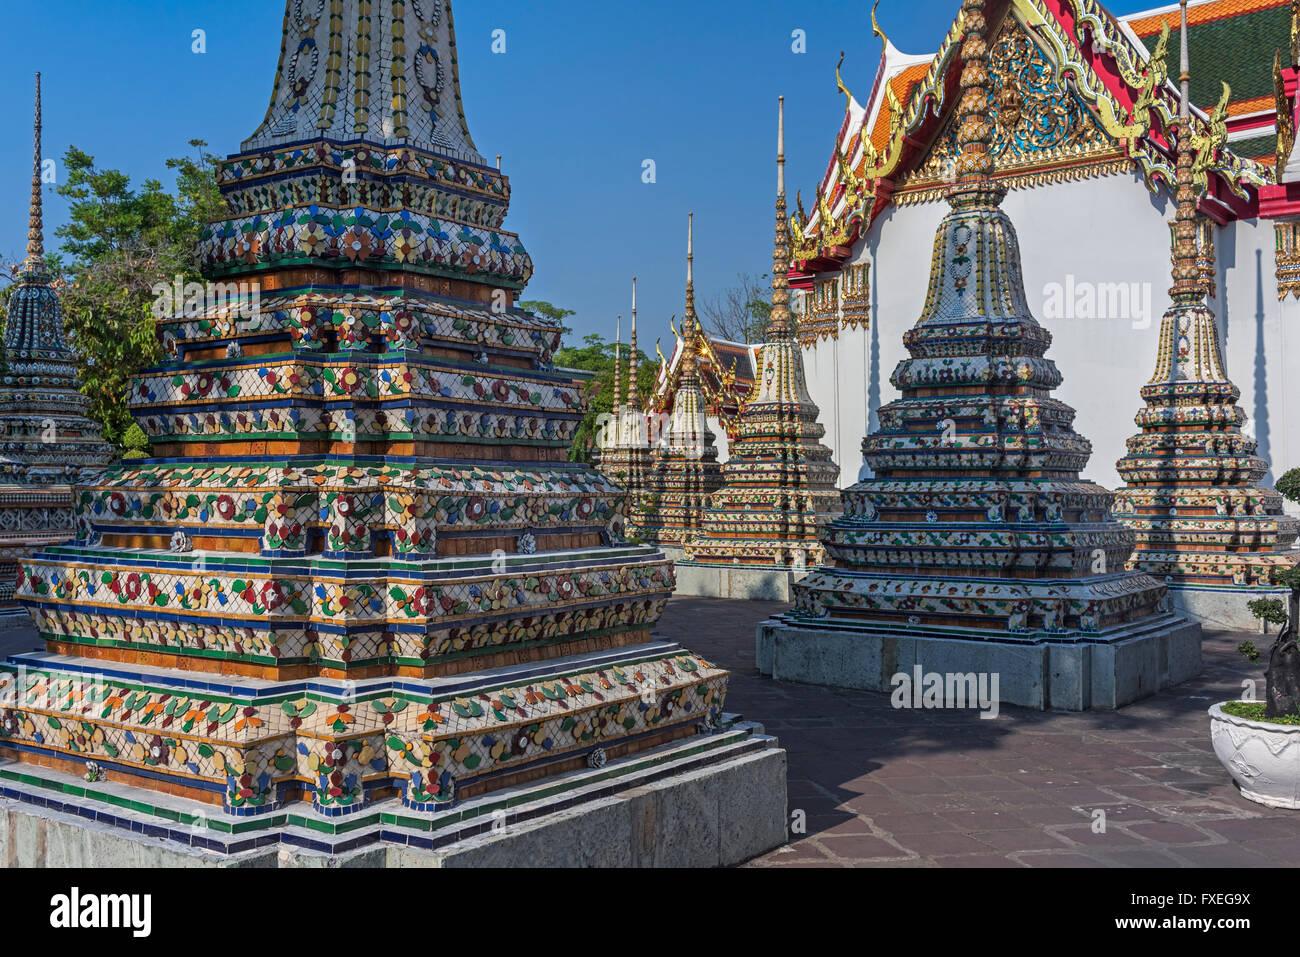 Wat Pho Bangkok Thailand - Stock Image